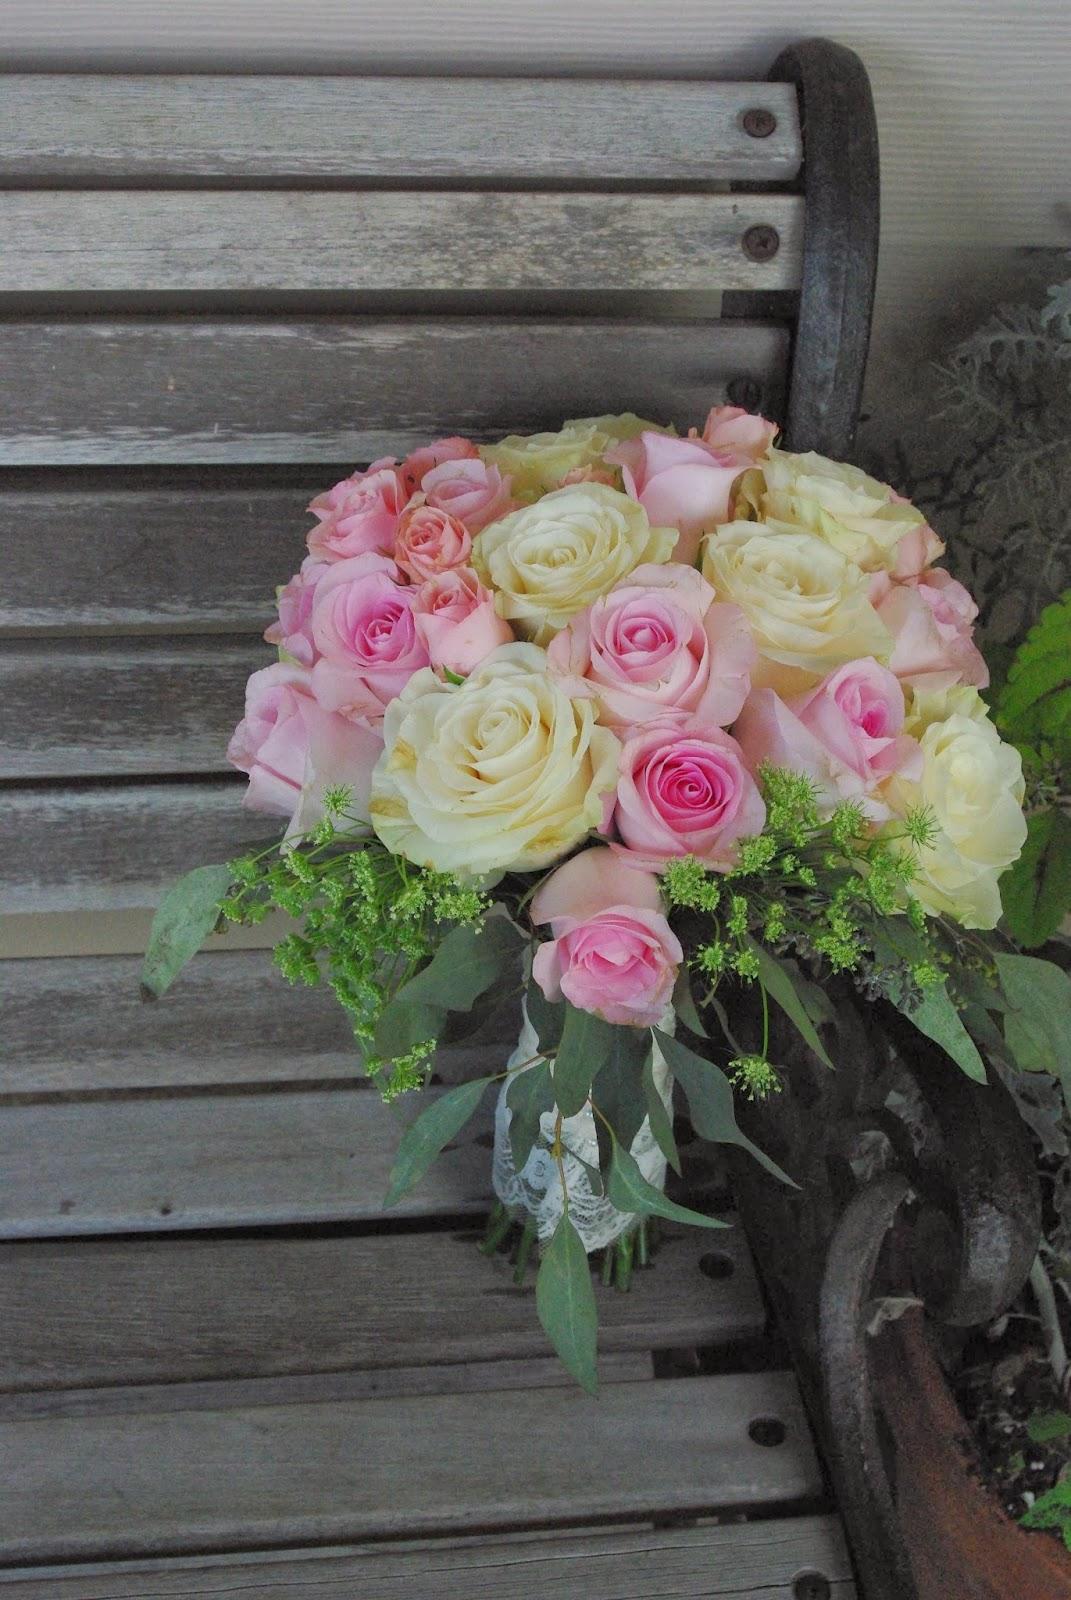 Tallahassee Florist Eight Bridal Bouquets Tallahassee Wedding Florist